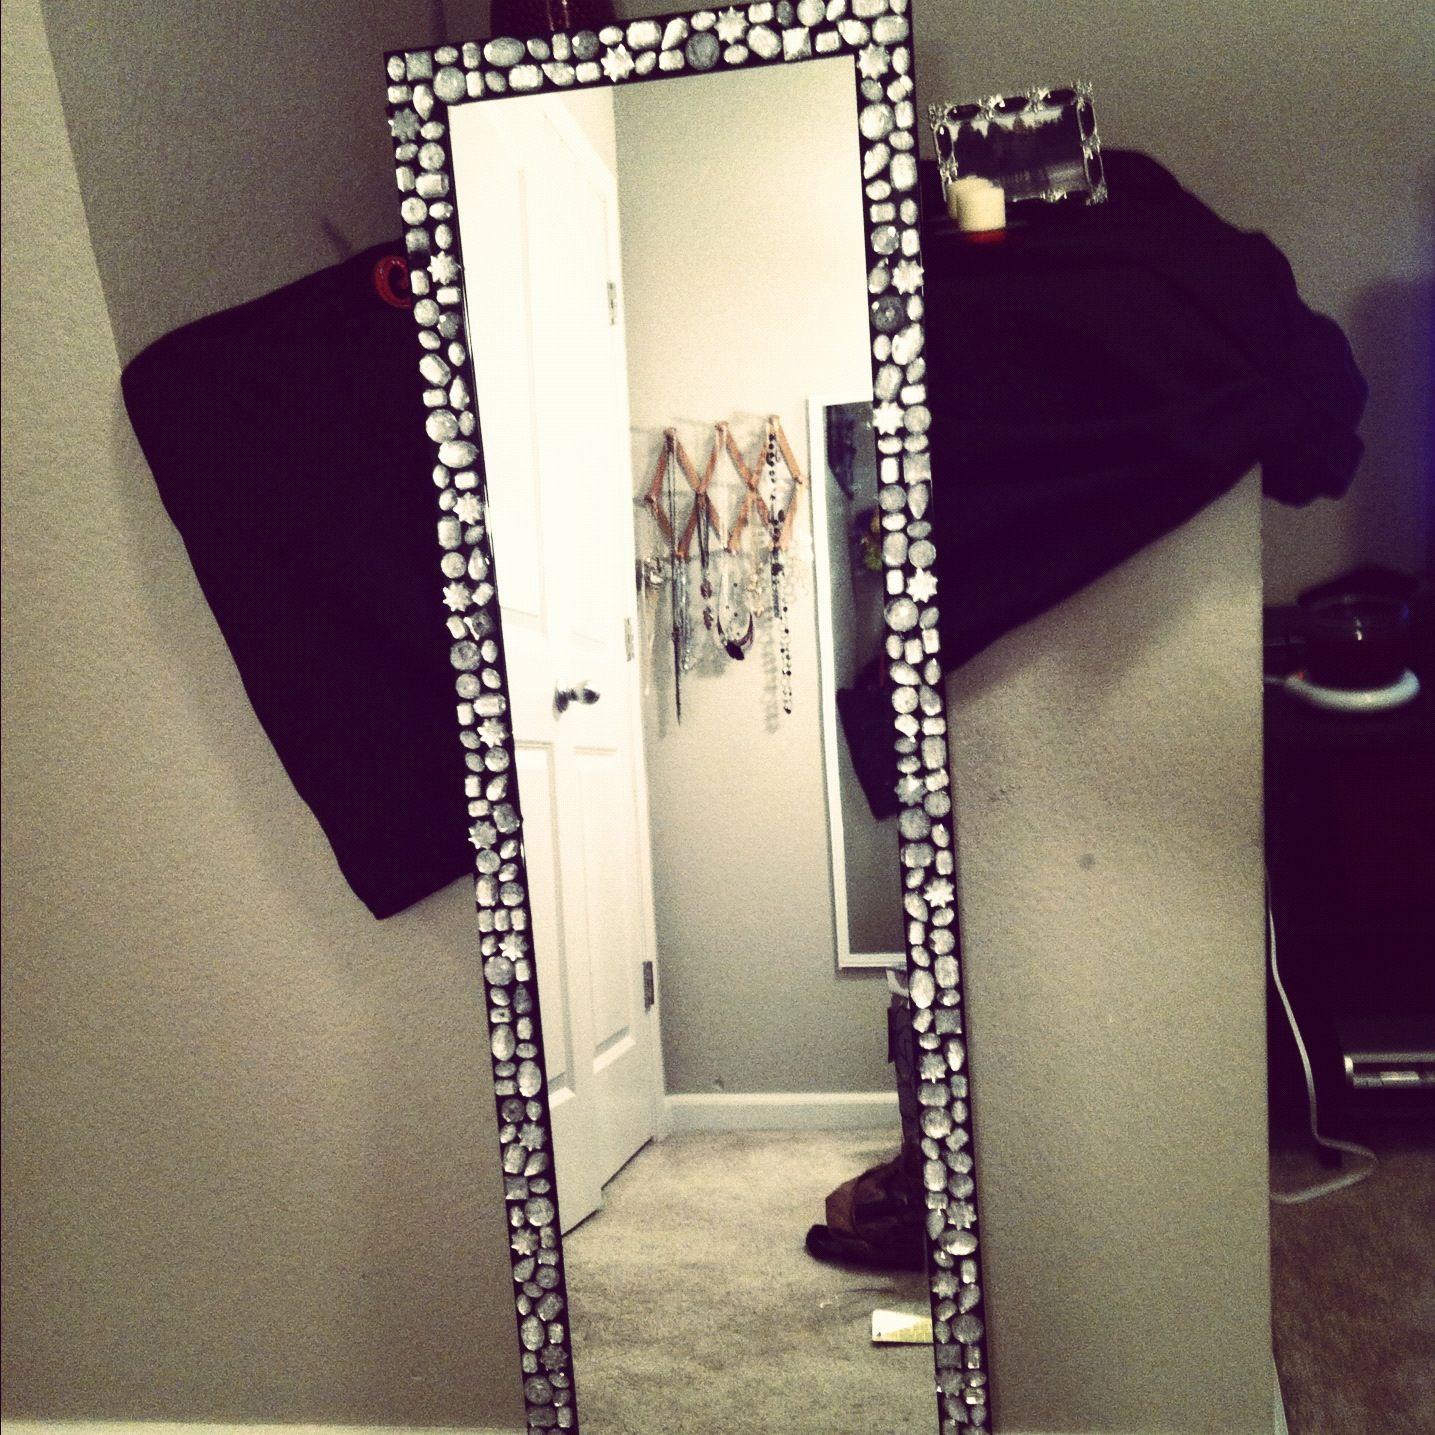 Bling Mirror My Sister And I Made For Her Dorm Room Bling Crafty Diy Mirror Dormdecor Room Diy Dorm Room Dorm Sweet Dorm